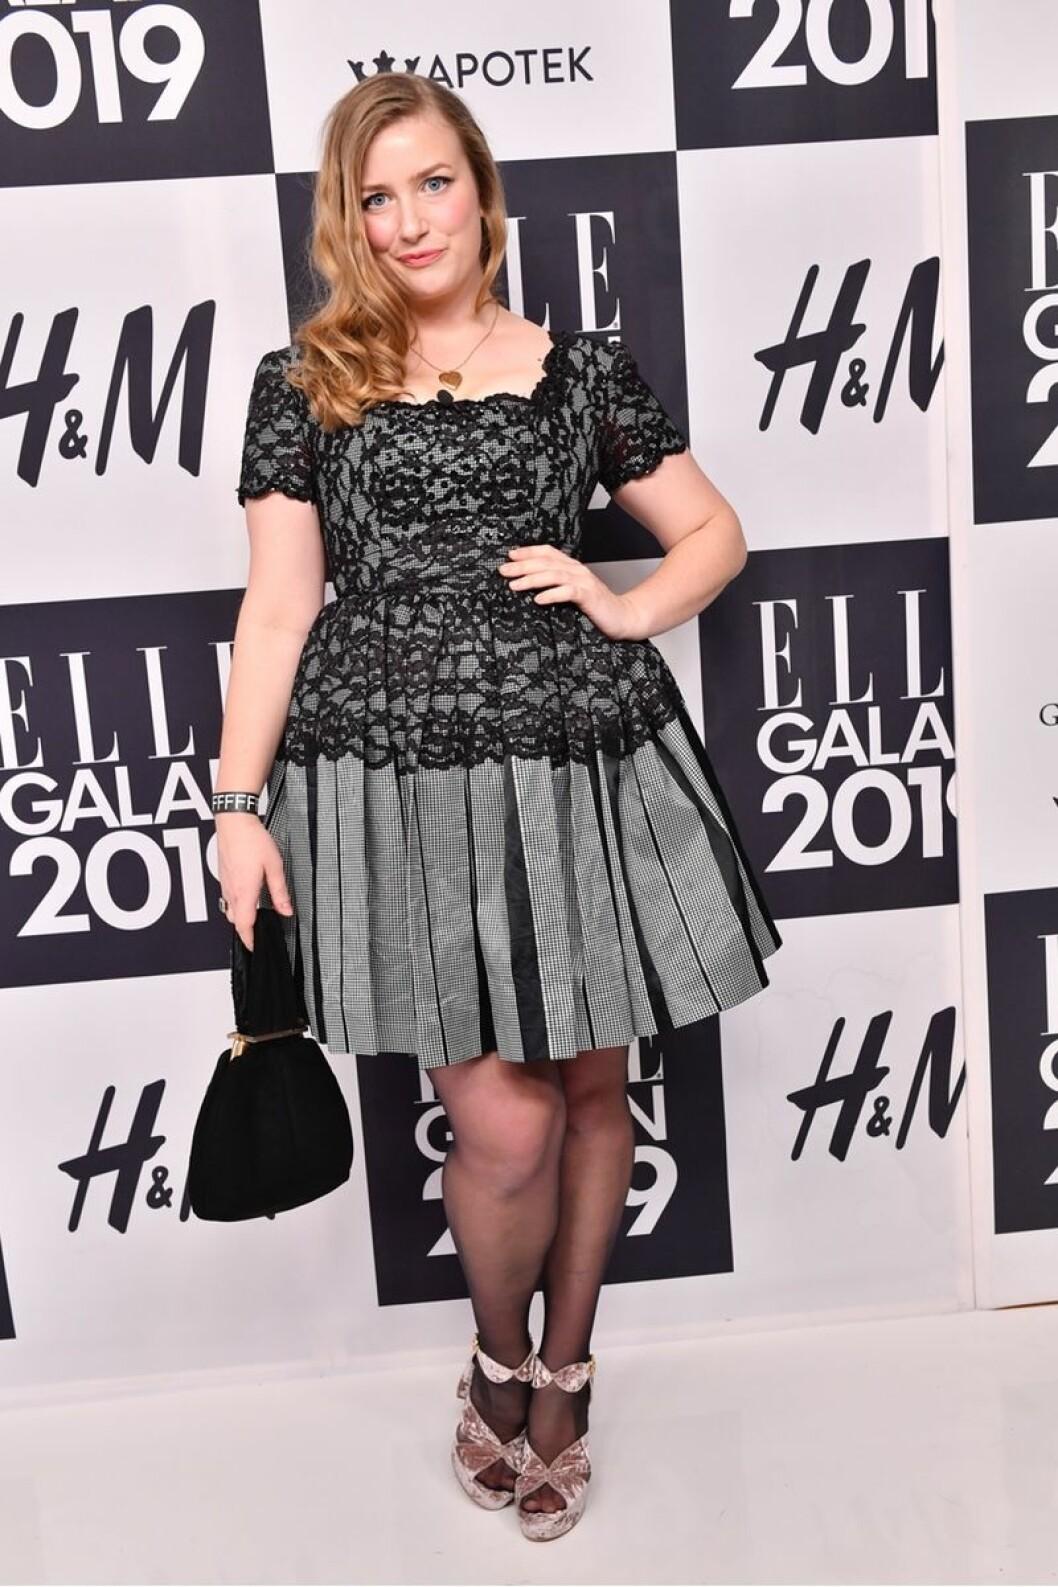 ELLE-galan 2019 Elsa Billgren